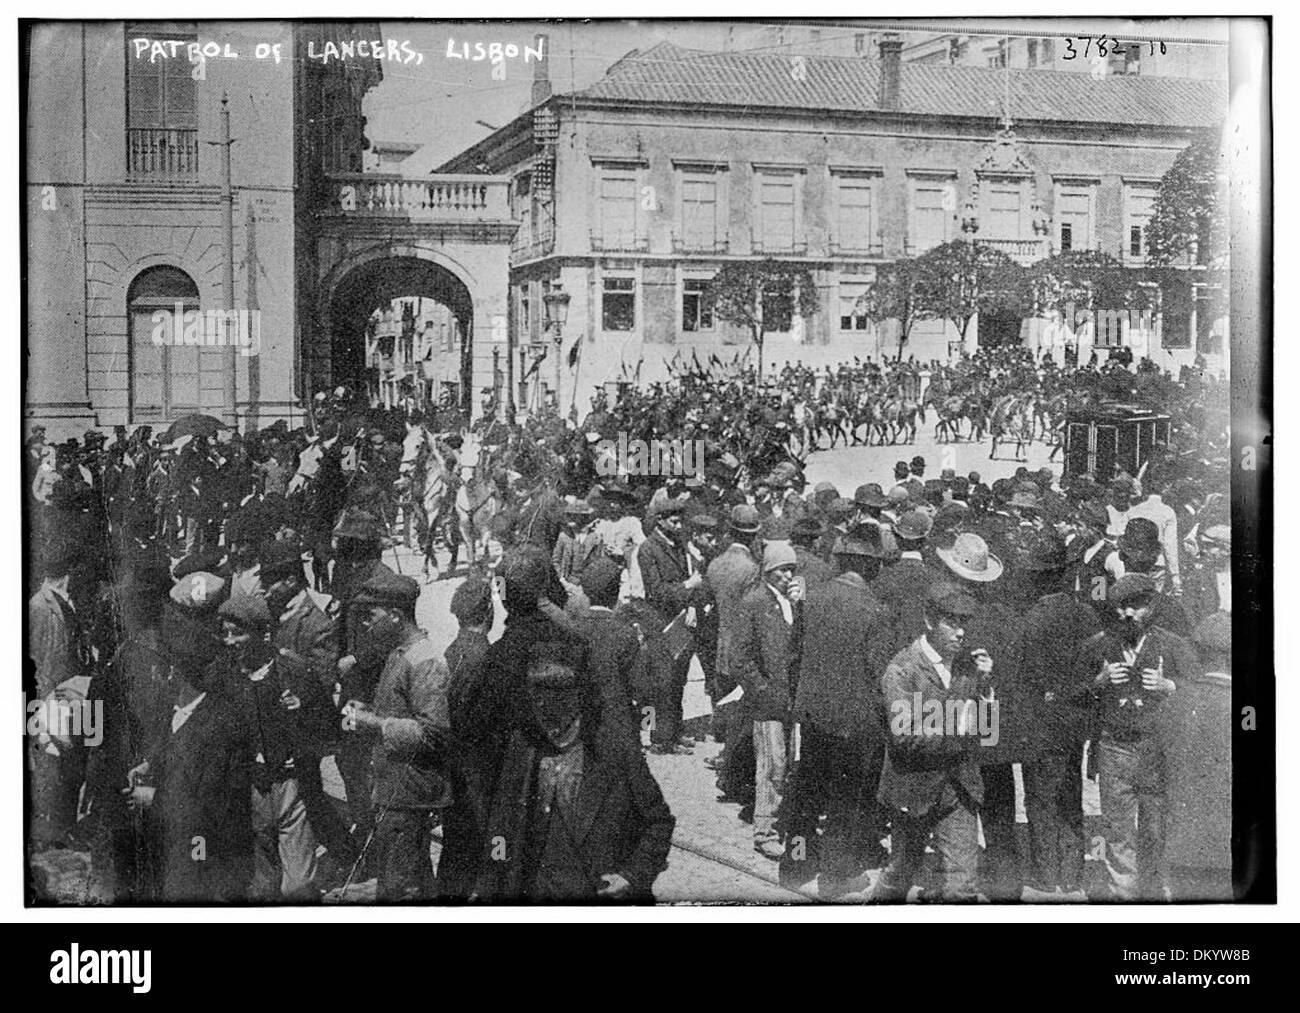 Patrol of Lancers, Lisbon (LOC) - Stock Image